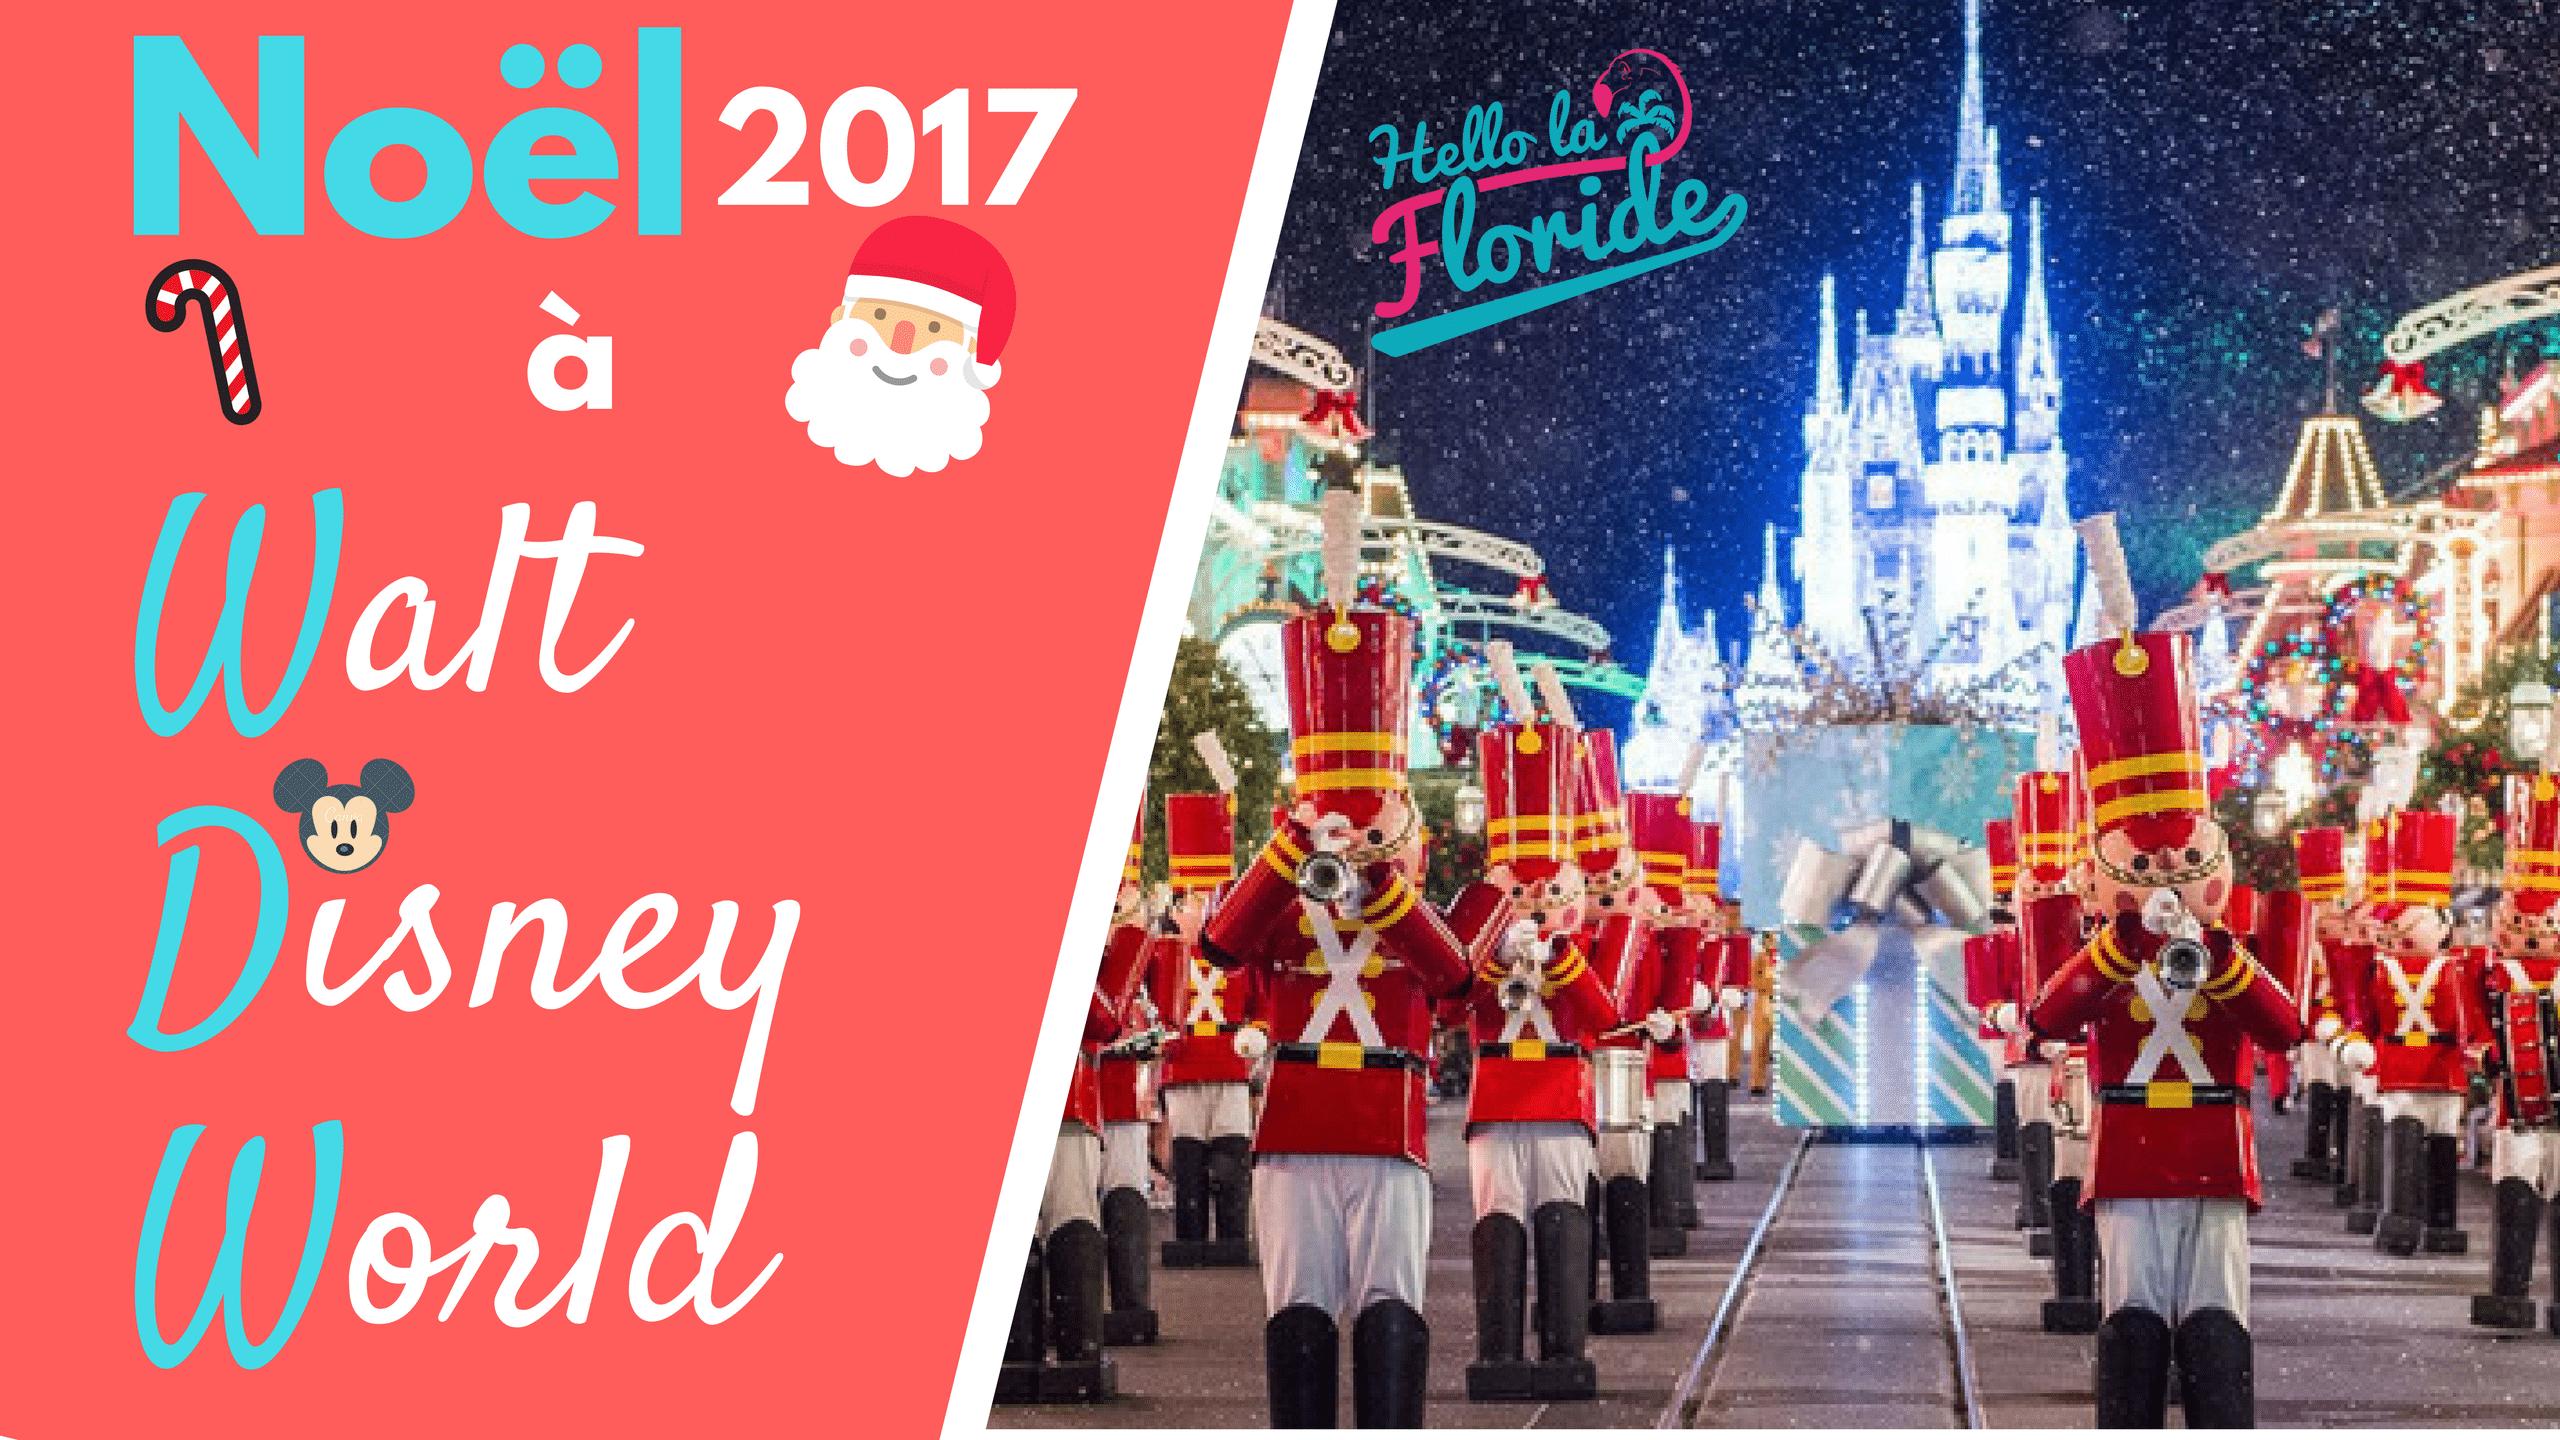 Image De Noel Walt Disney.Noel Walt Disney World Floride Parcs Attractions Hello La